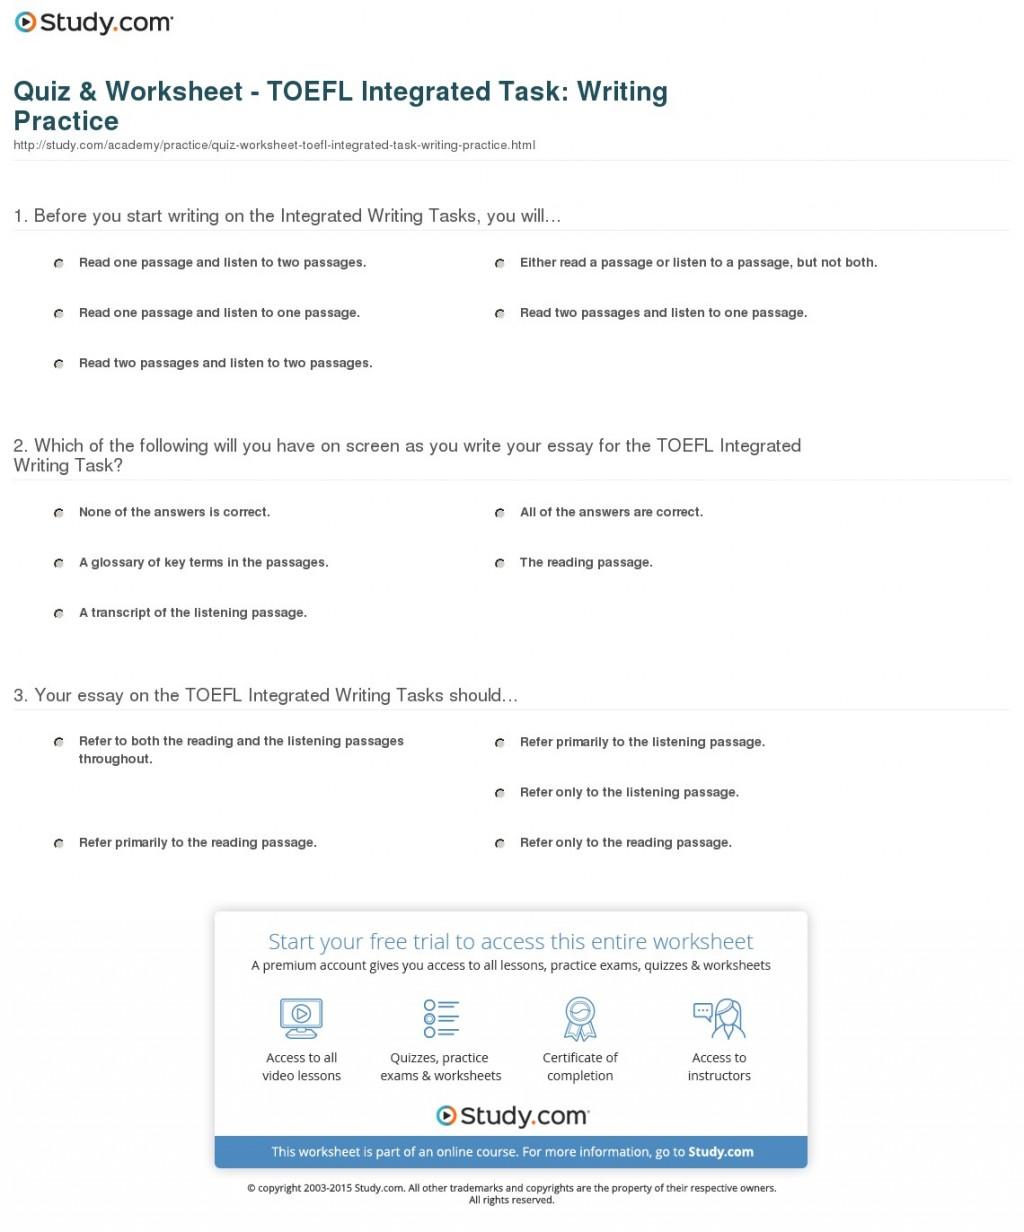 005 Essay Example Quiz Worksheet Toefl Integrated Task Writing Practice Ibt Topics Striking 2015 Large